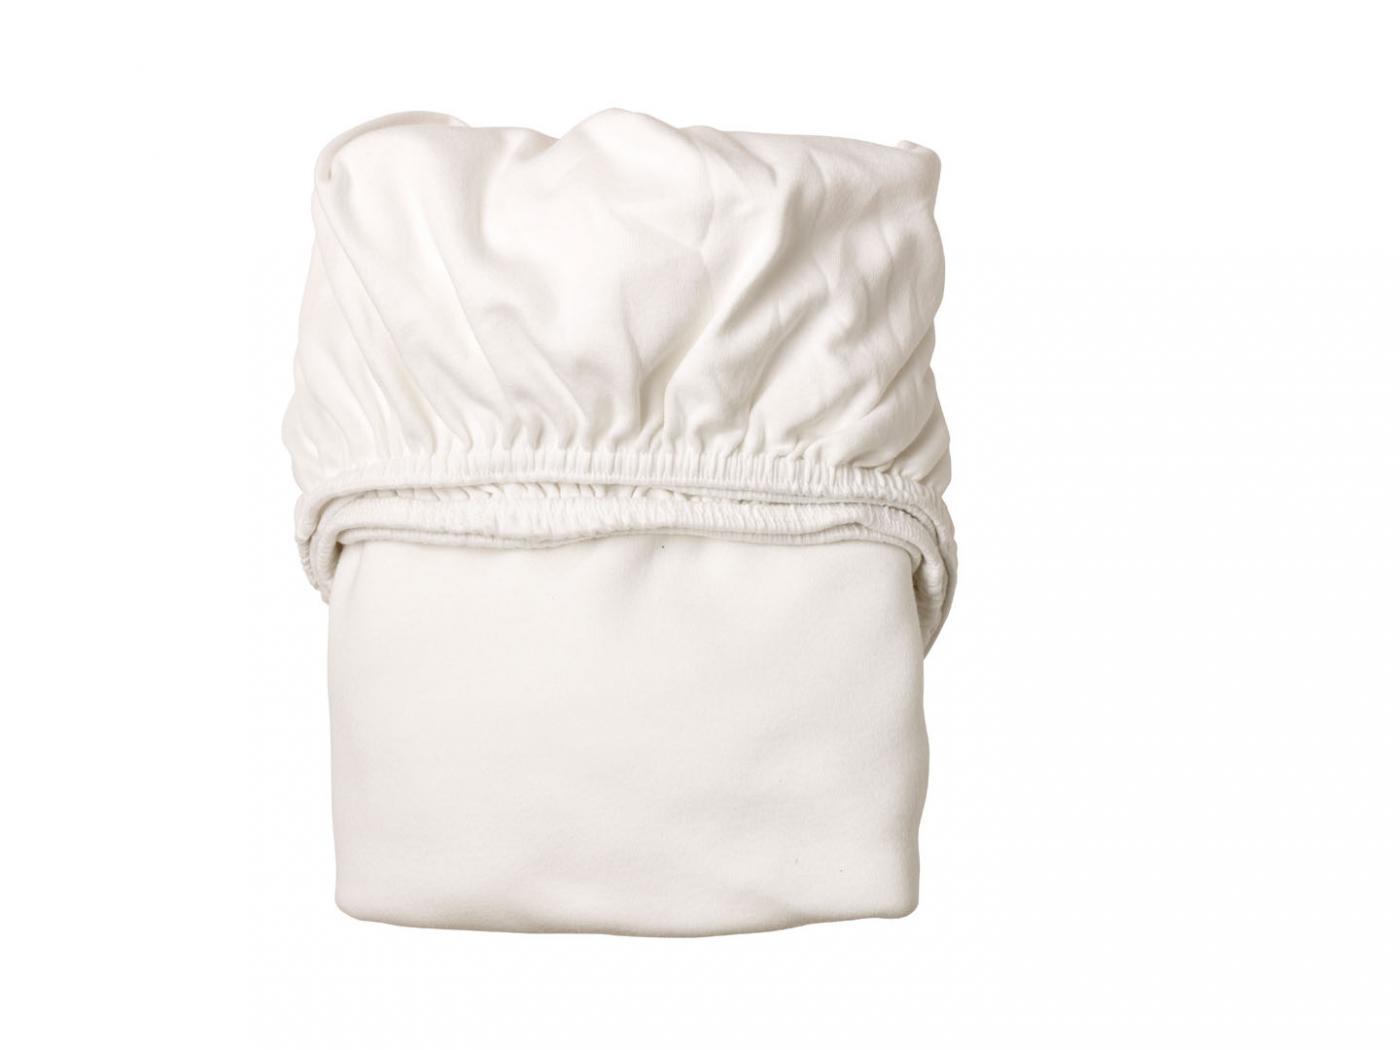 Leander draps housse b b blanc pour lit b b volutif for Drap housse lit evolutif